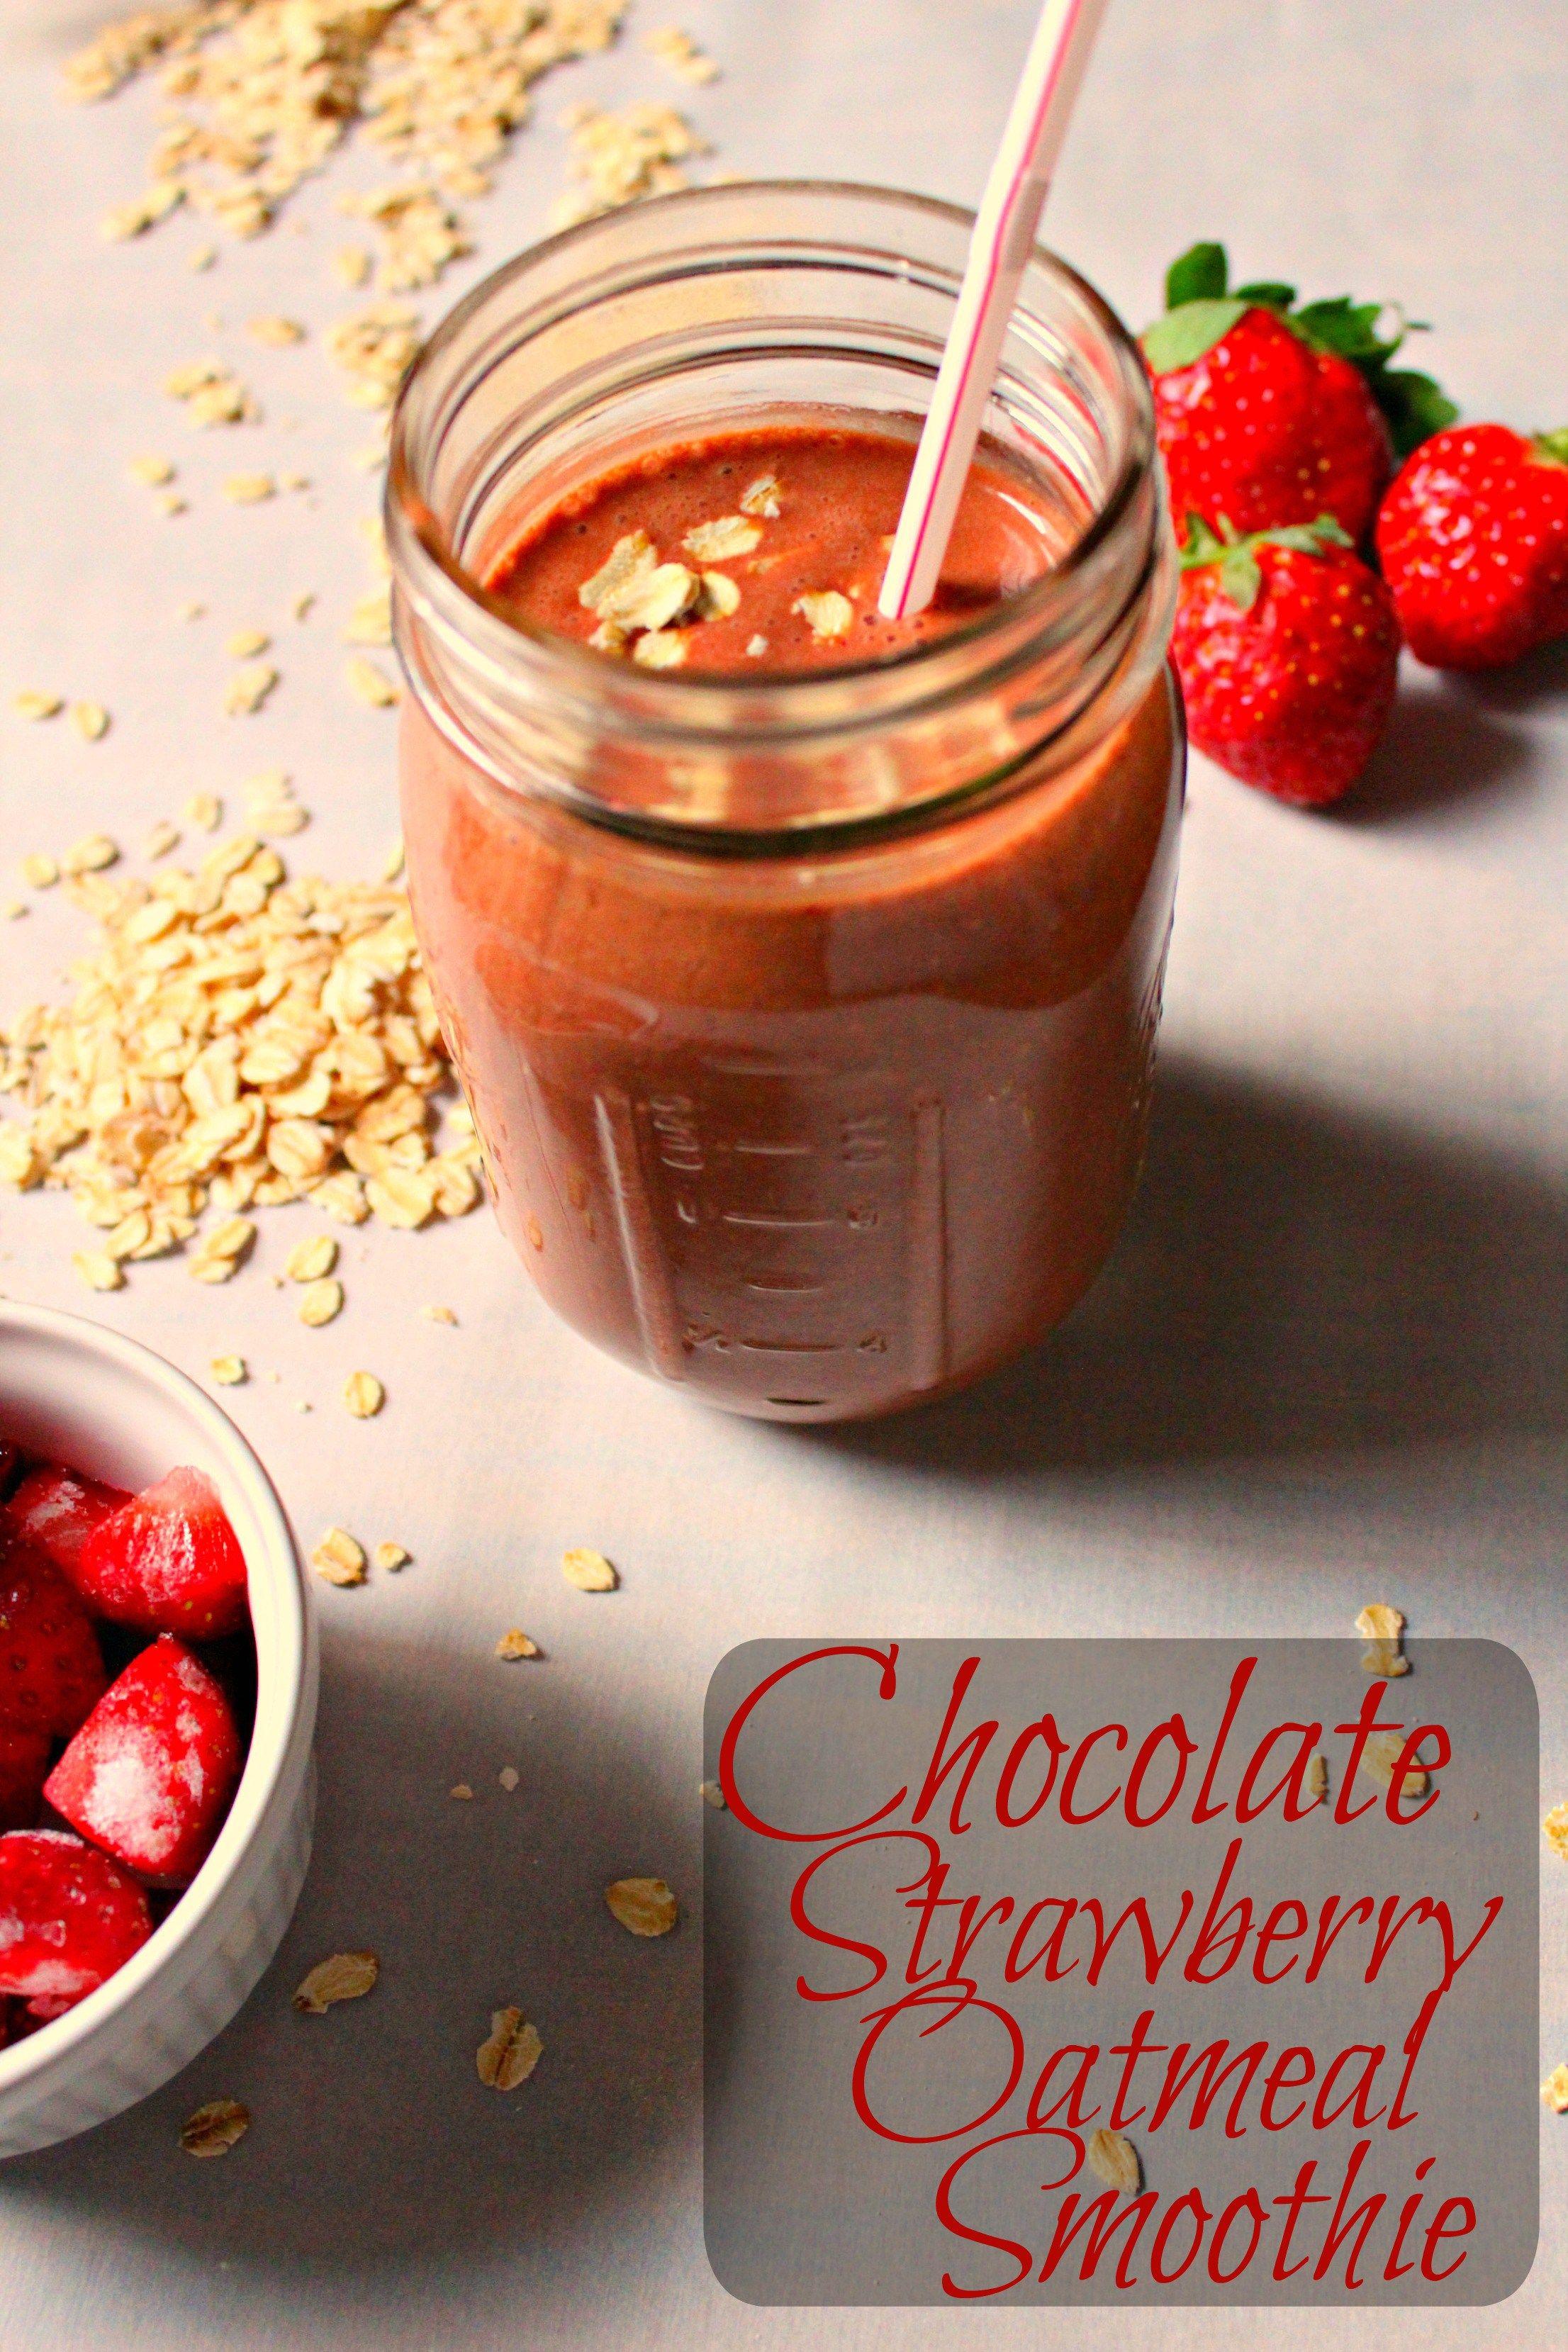 Chocolate Strawberry Oatmeal Smoothie #chocolatestrawberrysmoothie